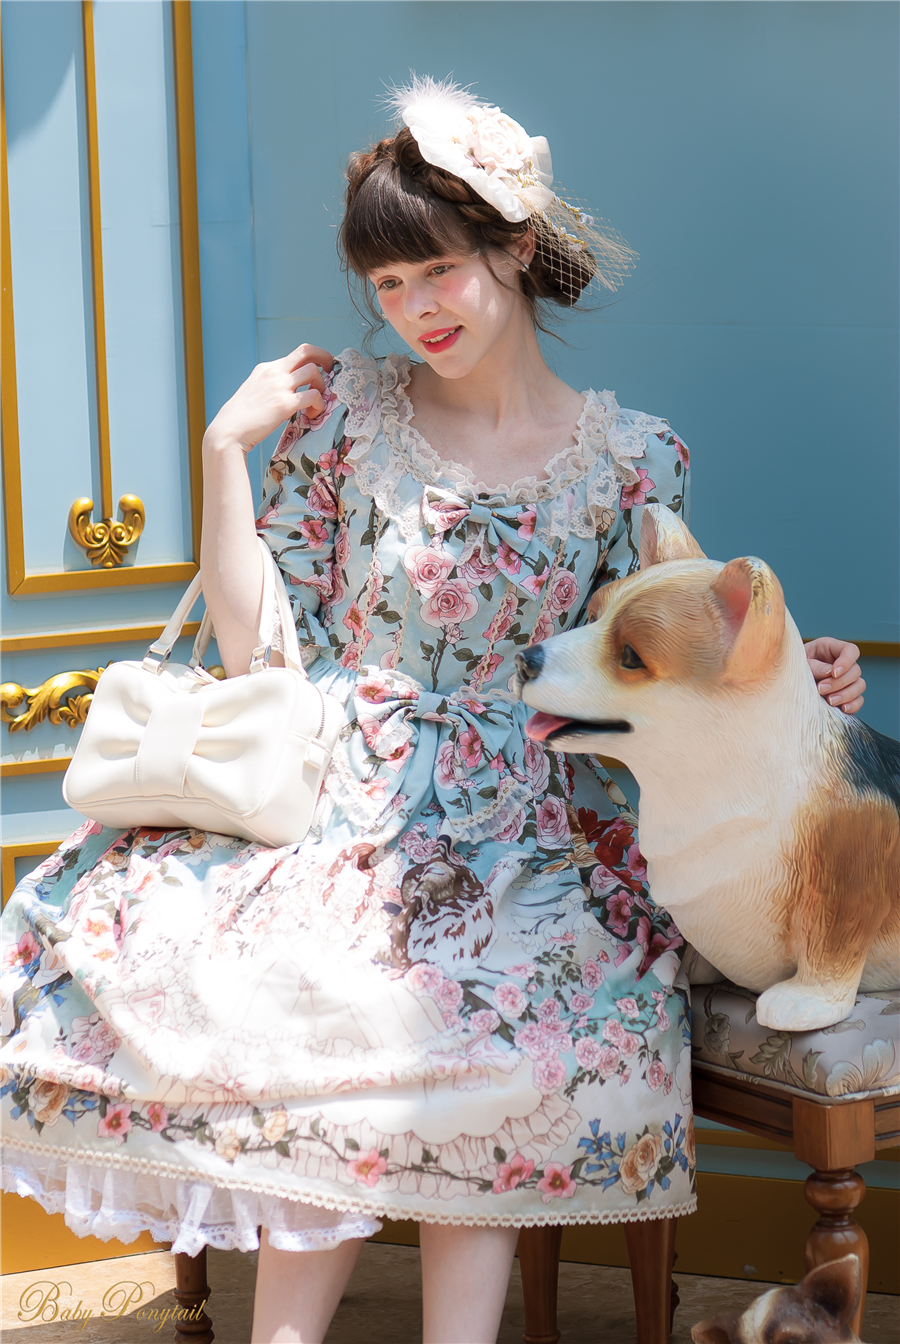 Baby Ponytail_Model Photo_Polly's Garden of Dreams_OP Lagoon Blue_Claudia_15.jpg